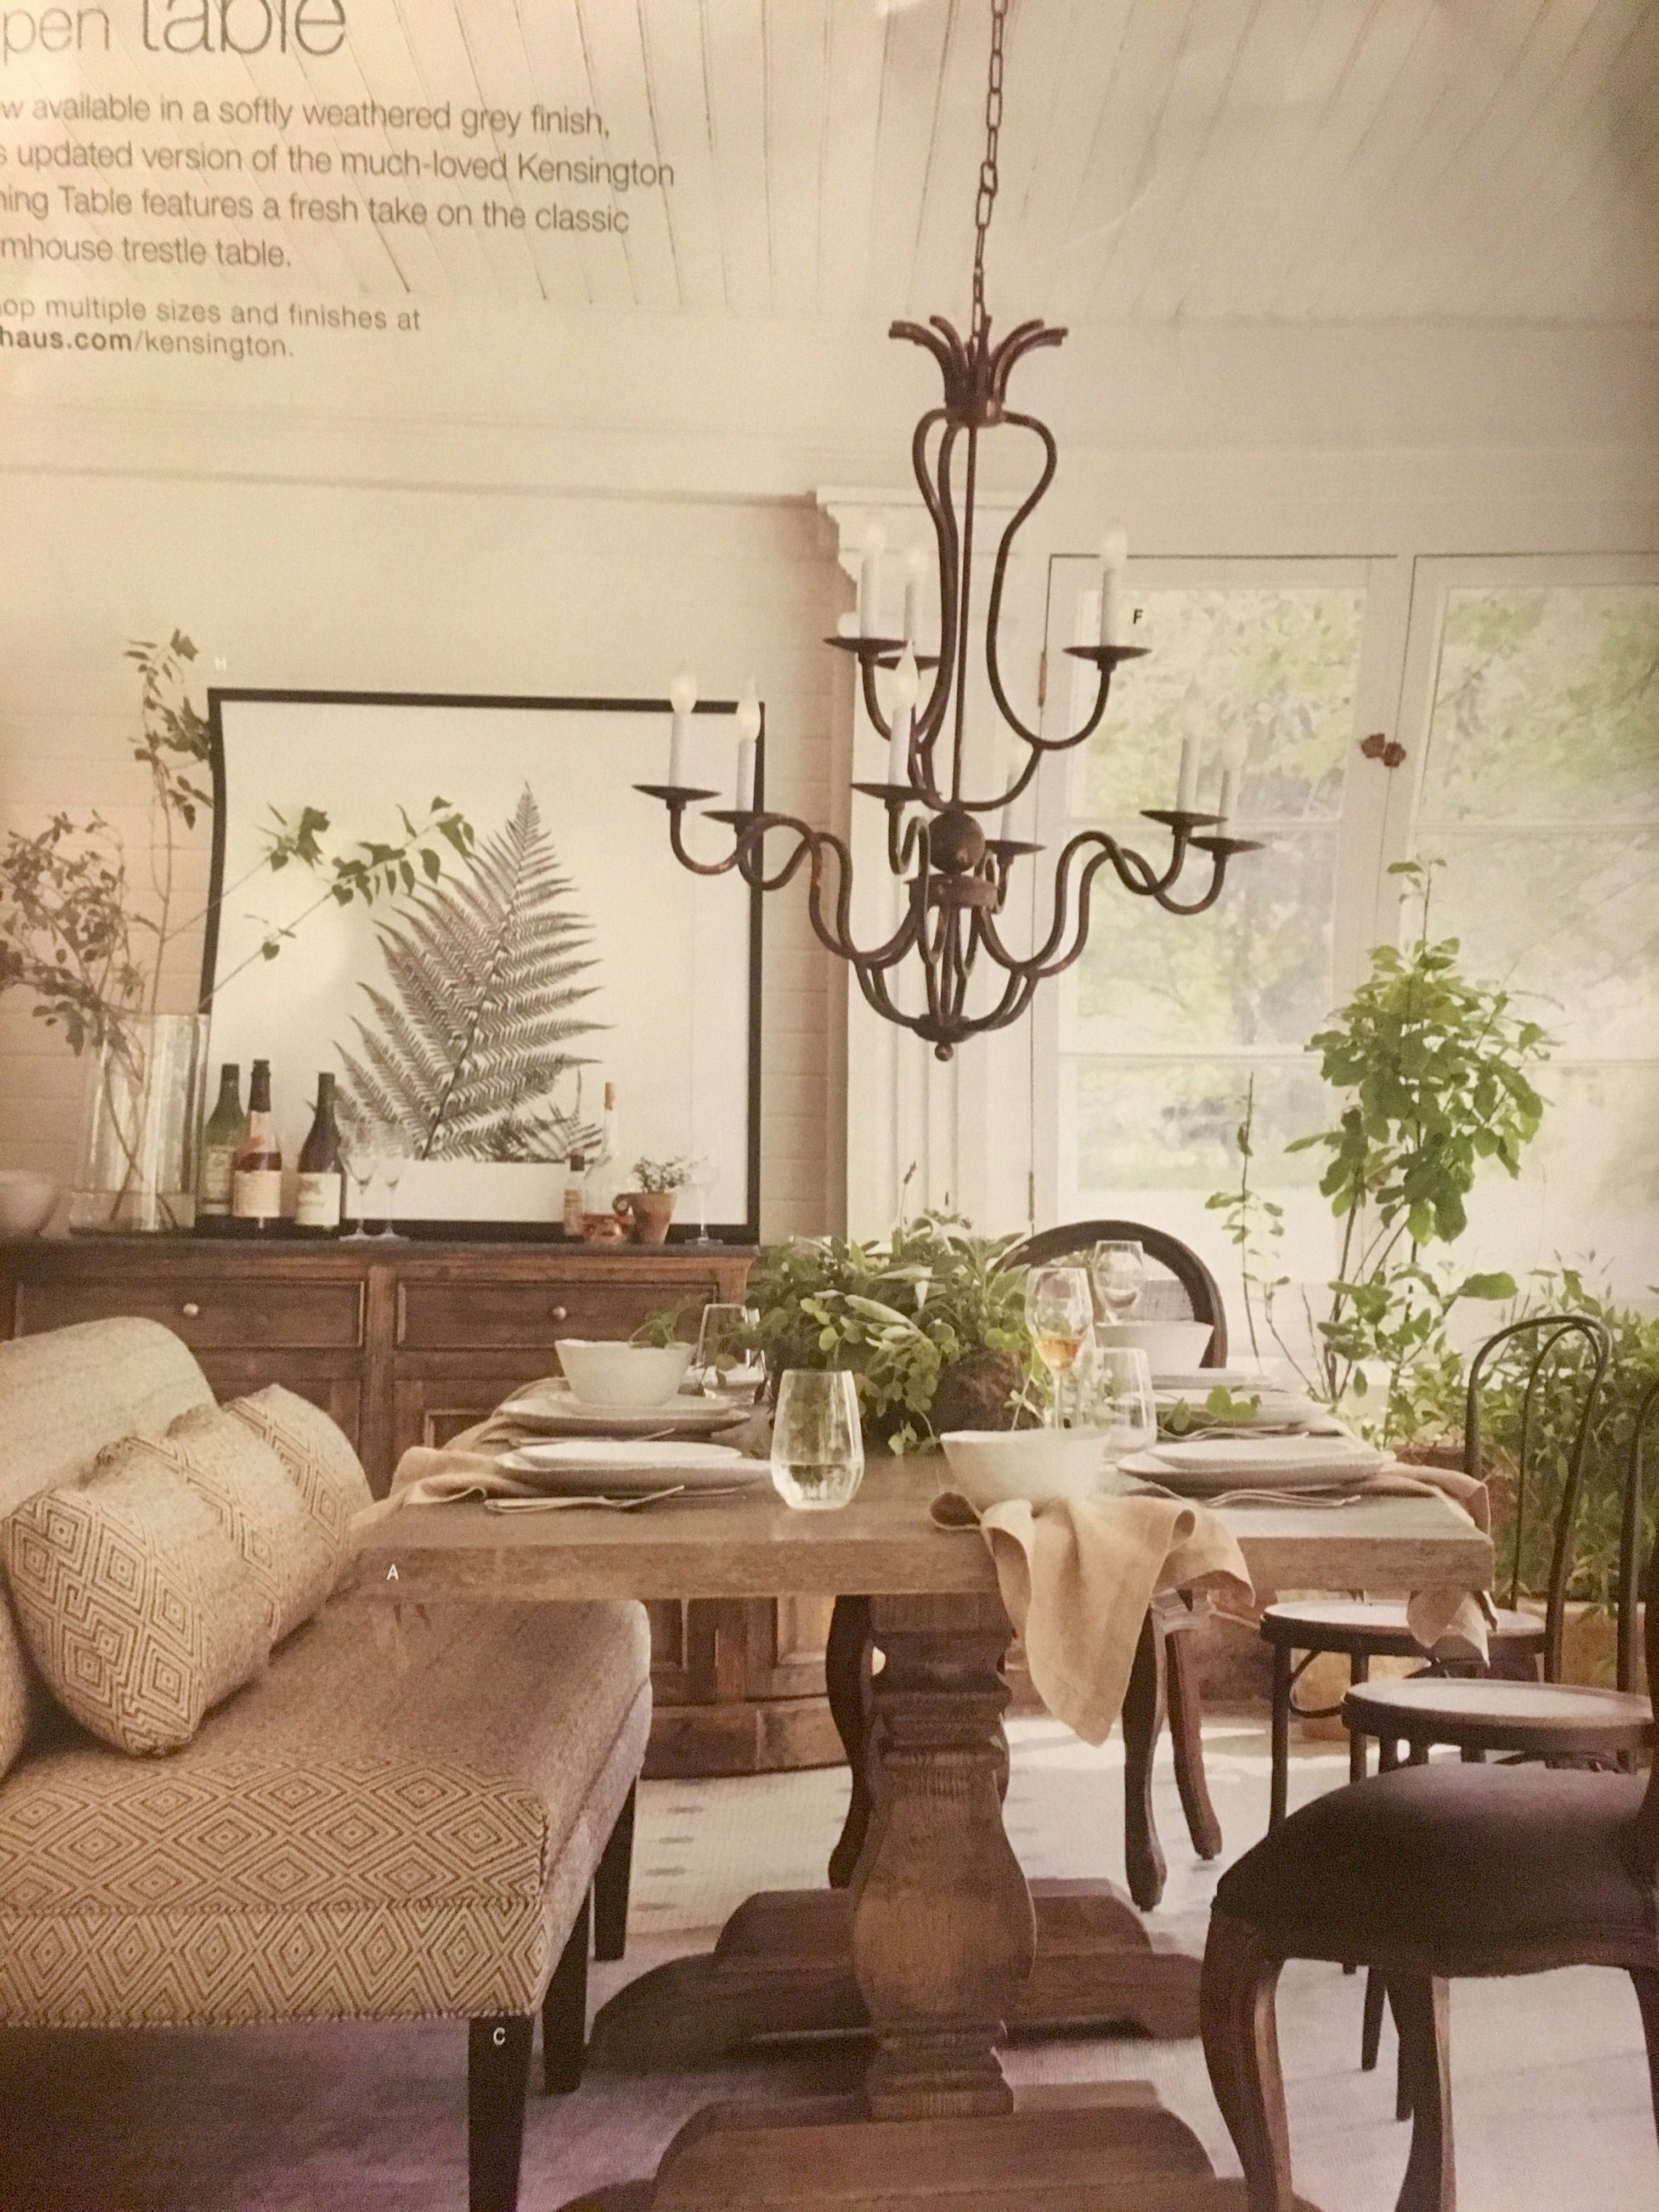 Arhaus Kensington Dining Table